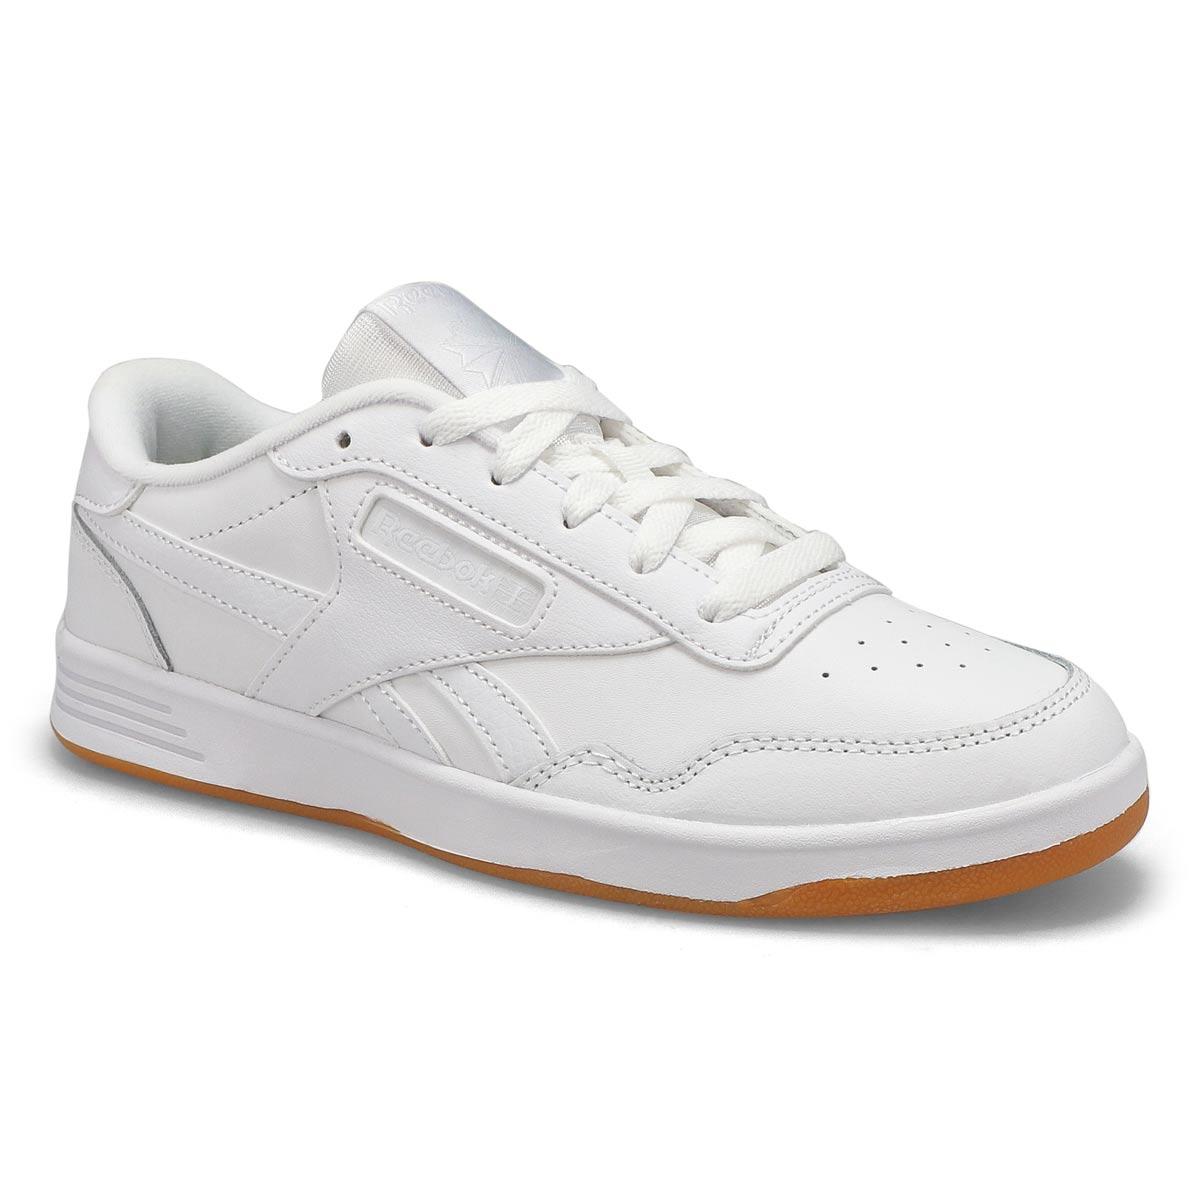 Women's Reebok Club Memt Sneaker - White/Gum